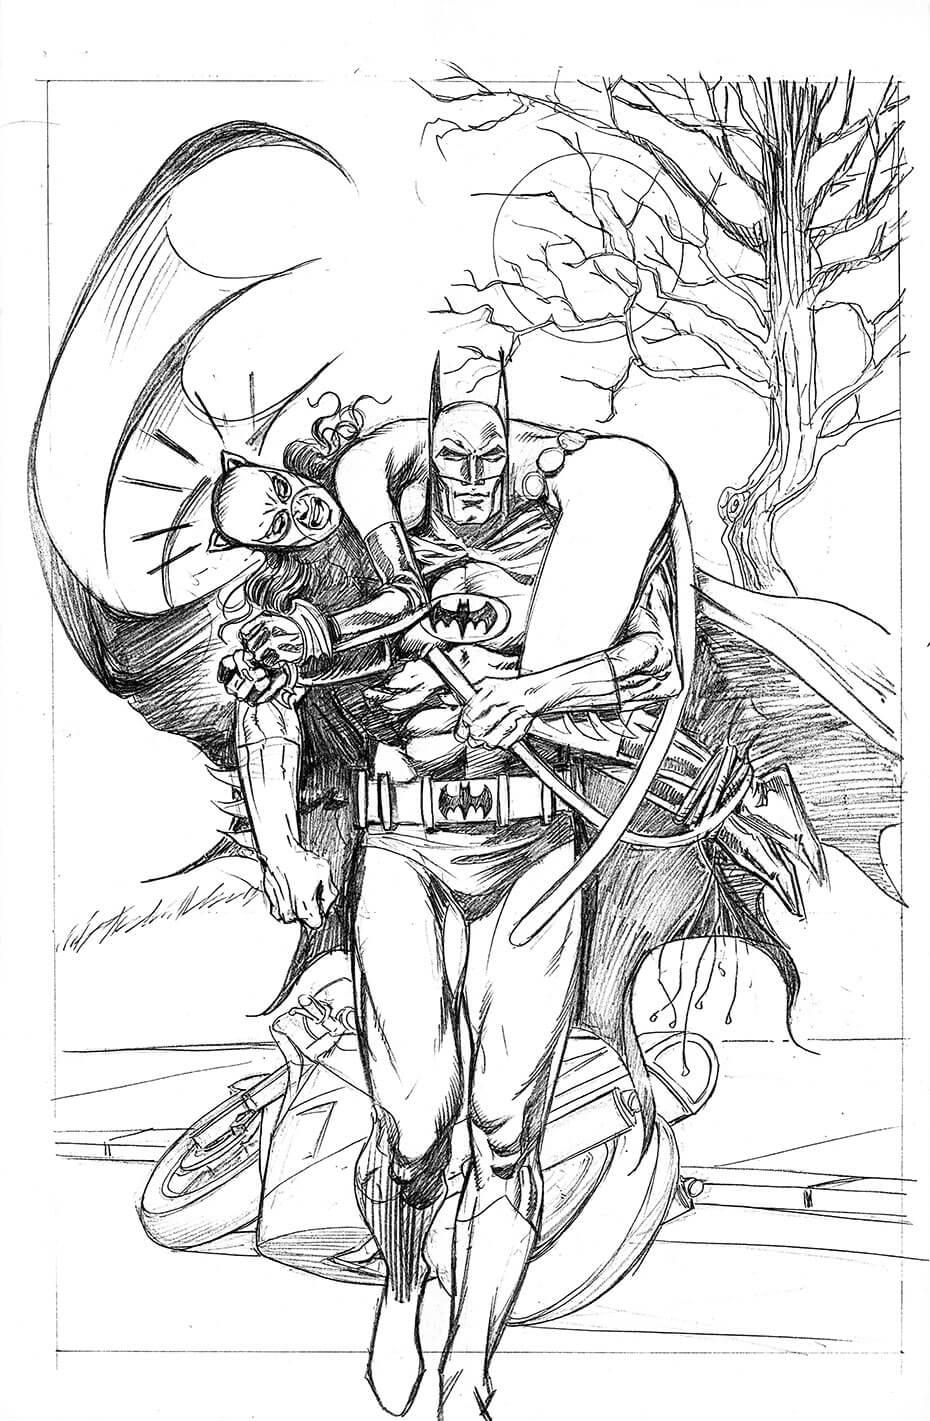 Artist: Lenin Delsol > Style: B&W Pencil > Category: Comics, Superhero